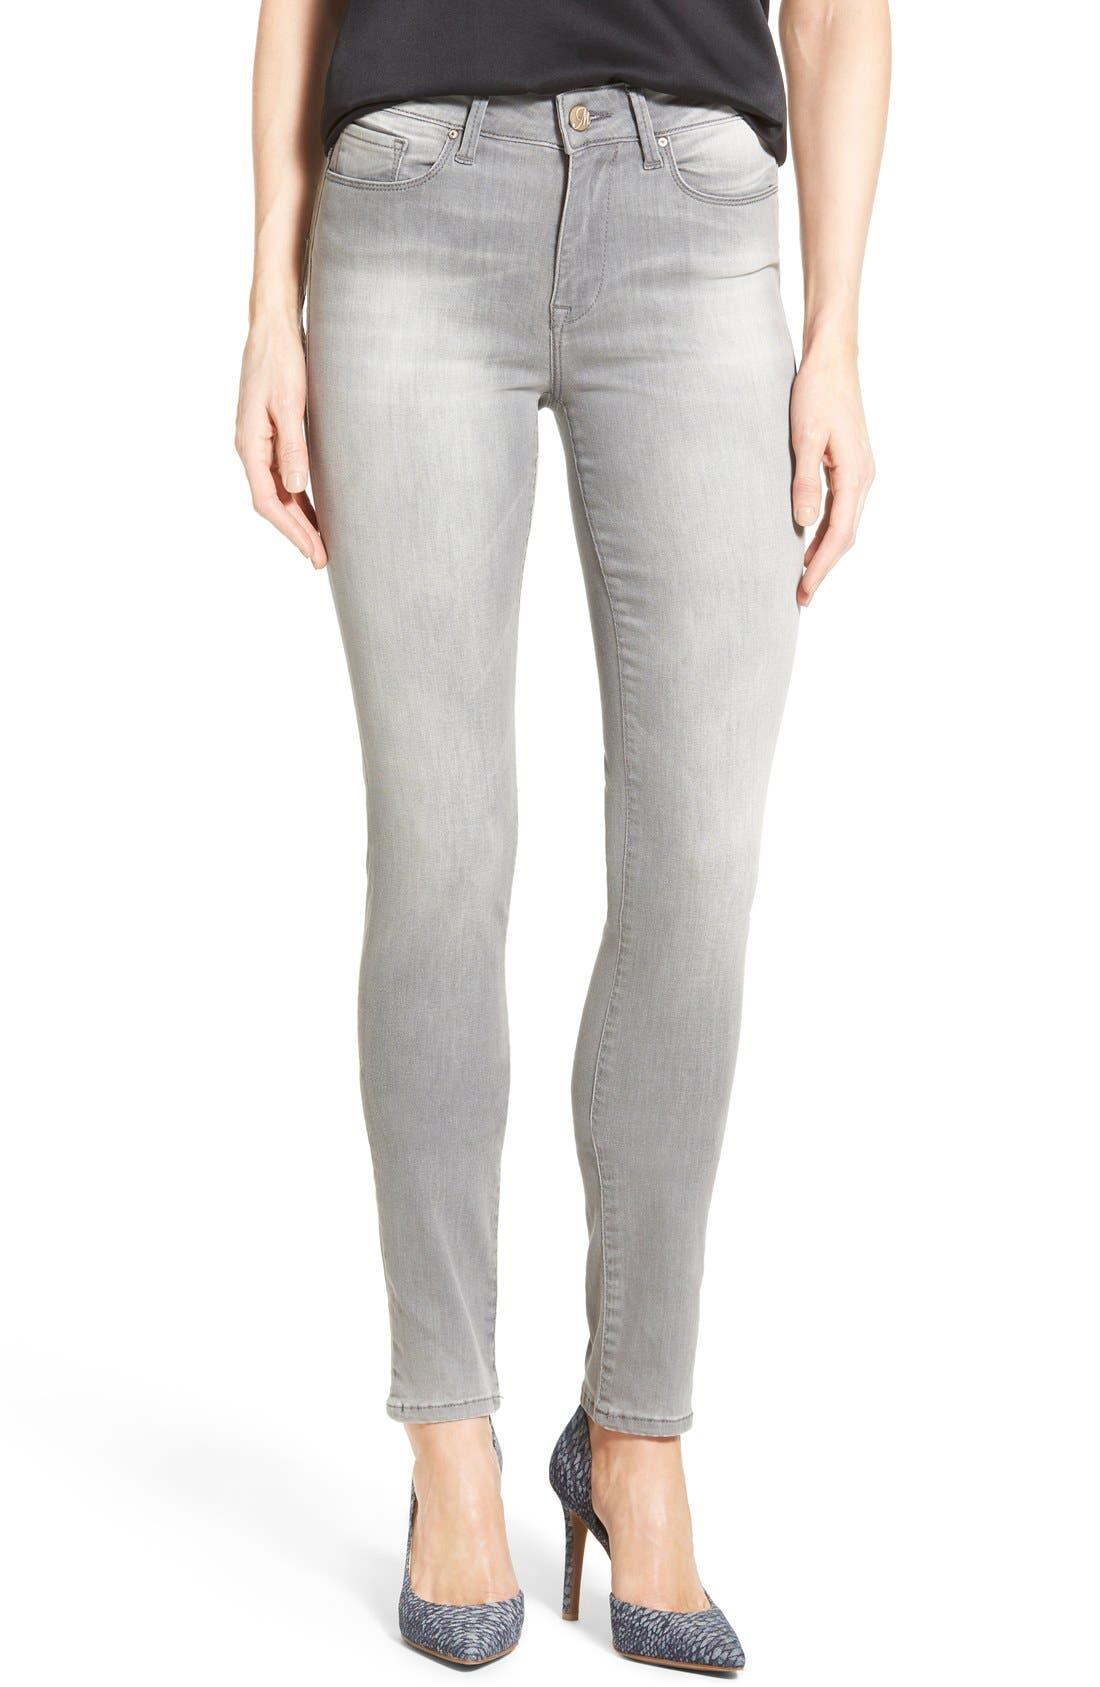 'Alissa' Stretch Skinny Jeans,                             Main thumbnail 1, color,                             Alissa Light Grey Tribeca